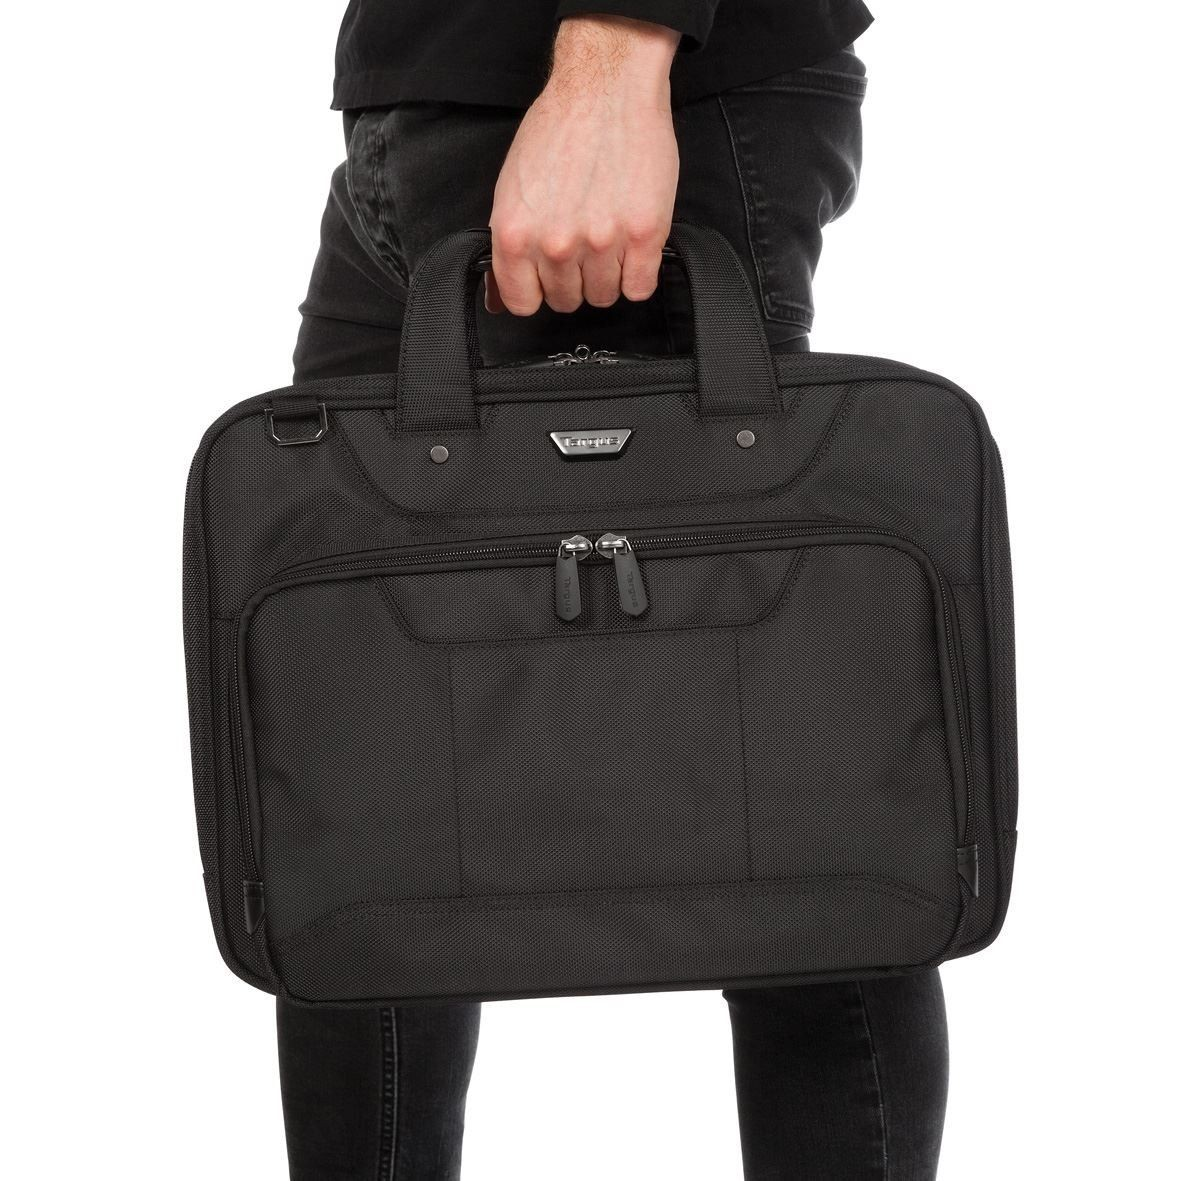 Targus Corporate Traveller 15.6'' Topload Laptop Case - Black